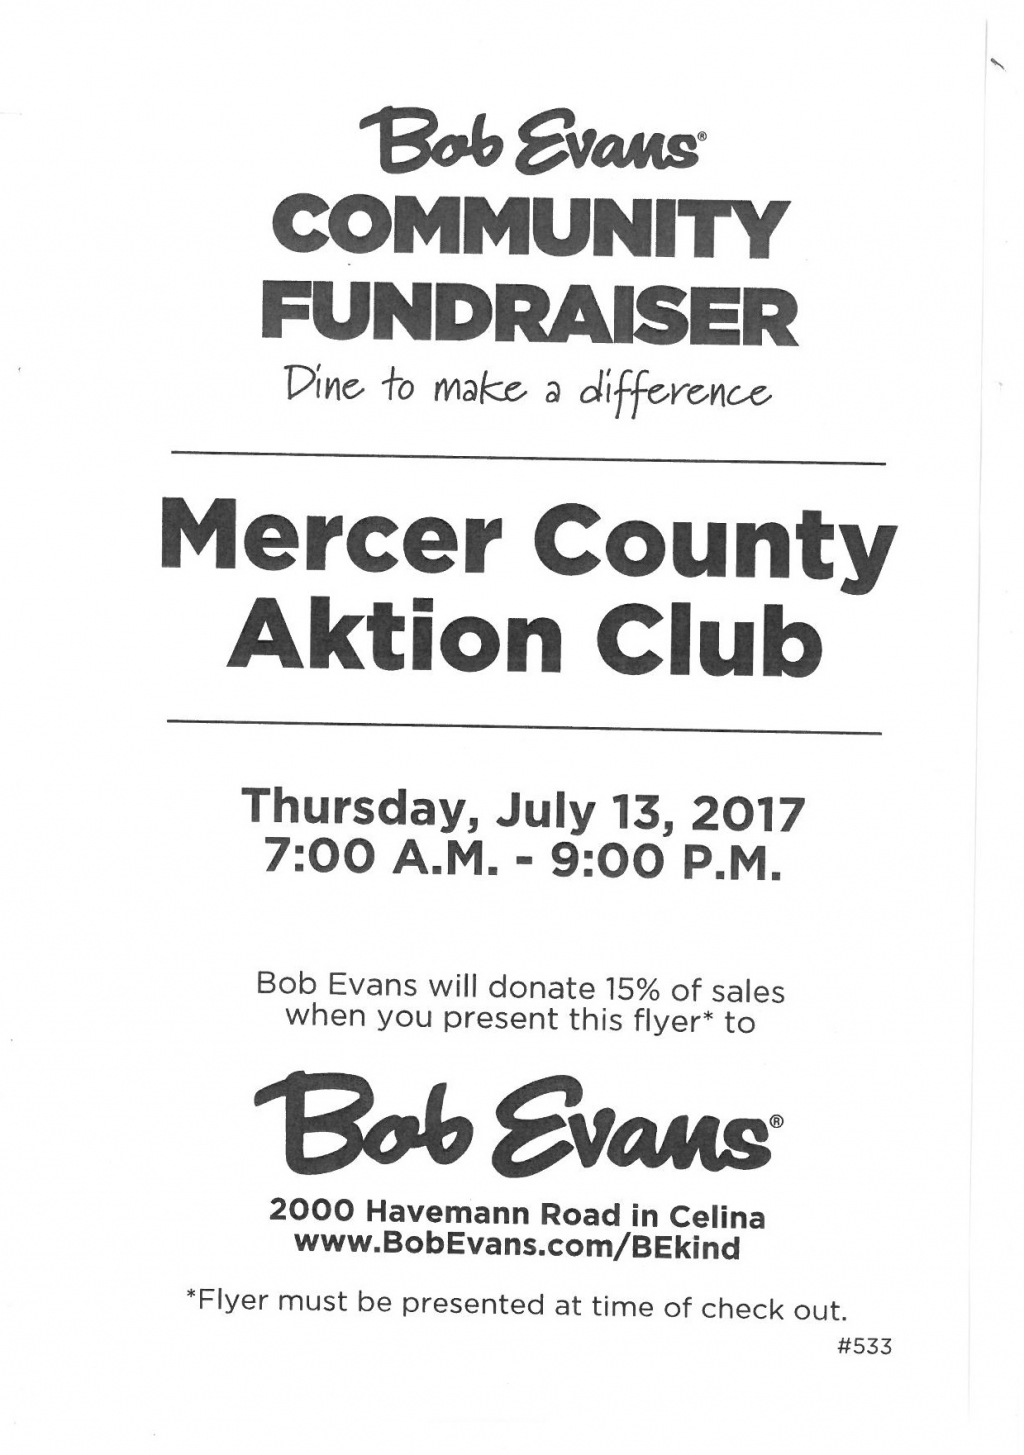 Mercer County Aktion Club Community Fundraiser at Bob Evans